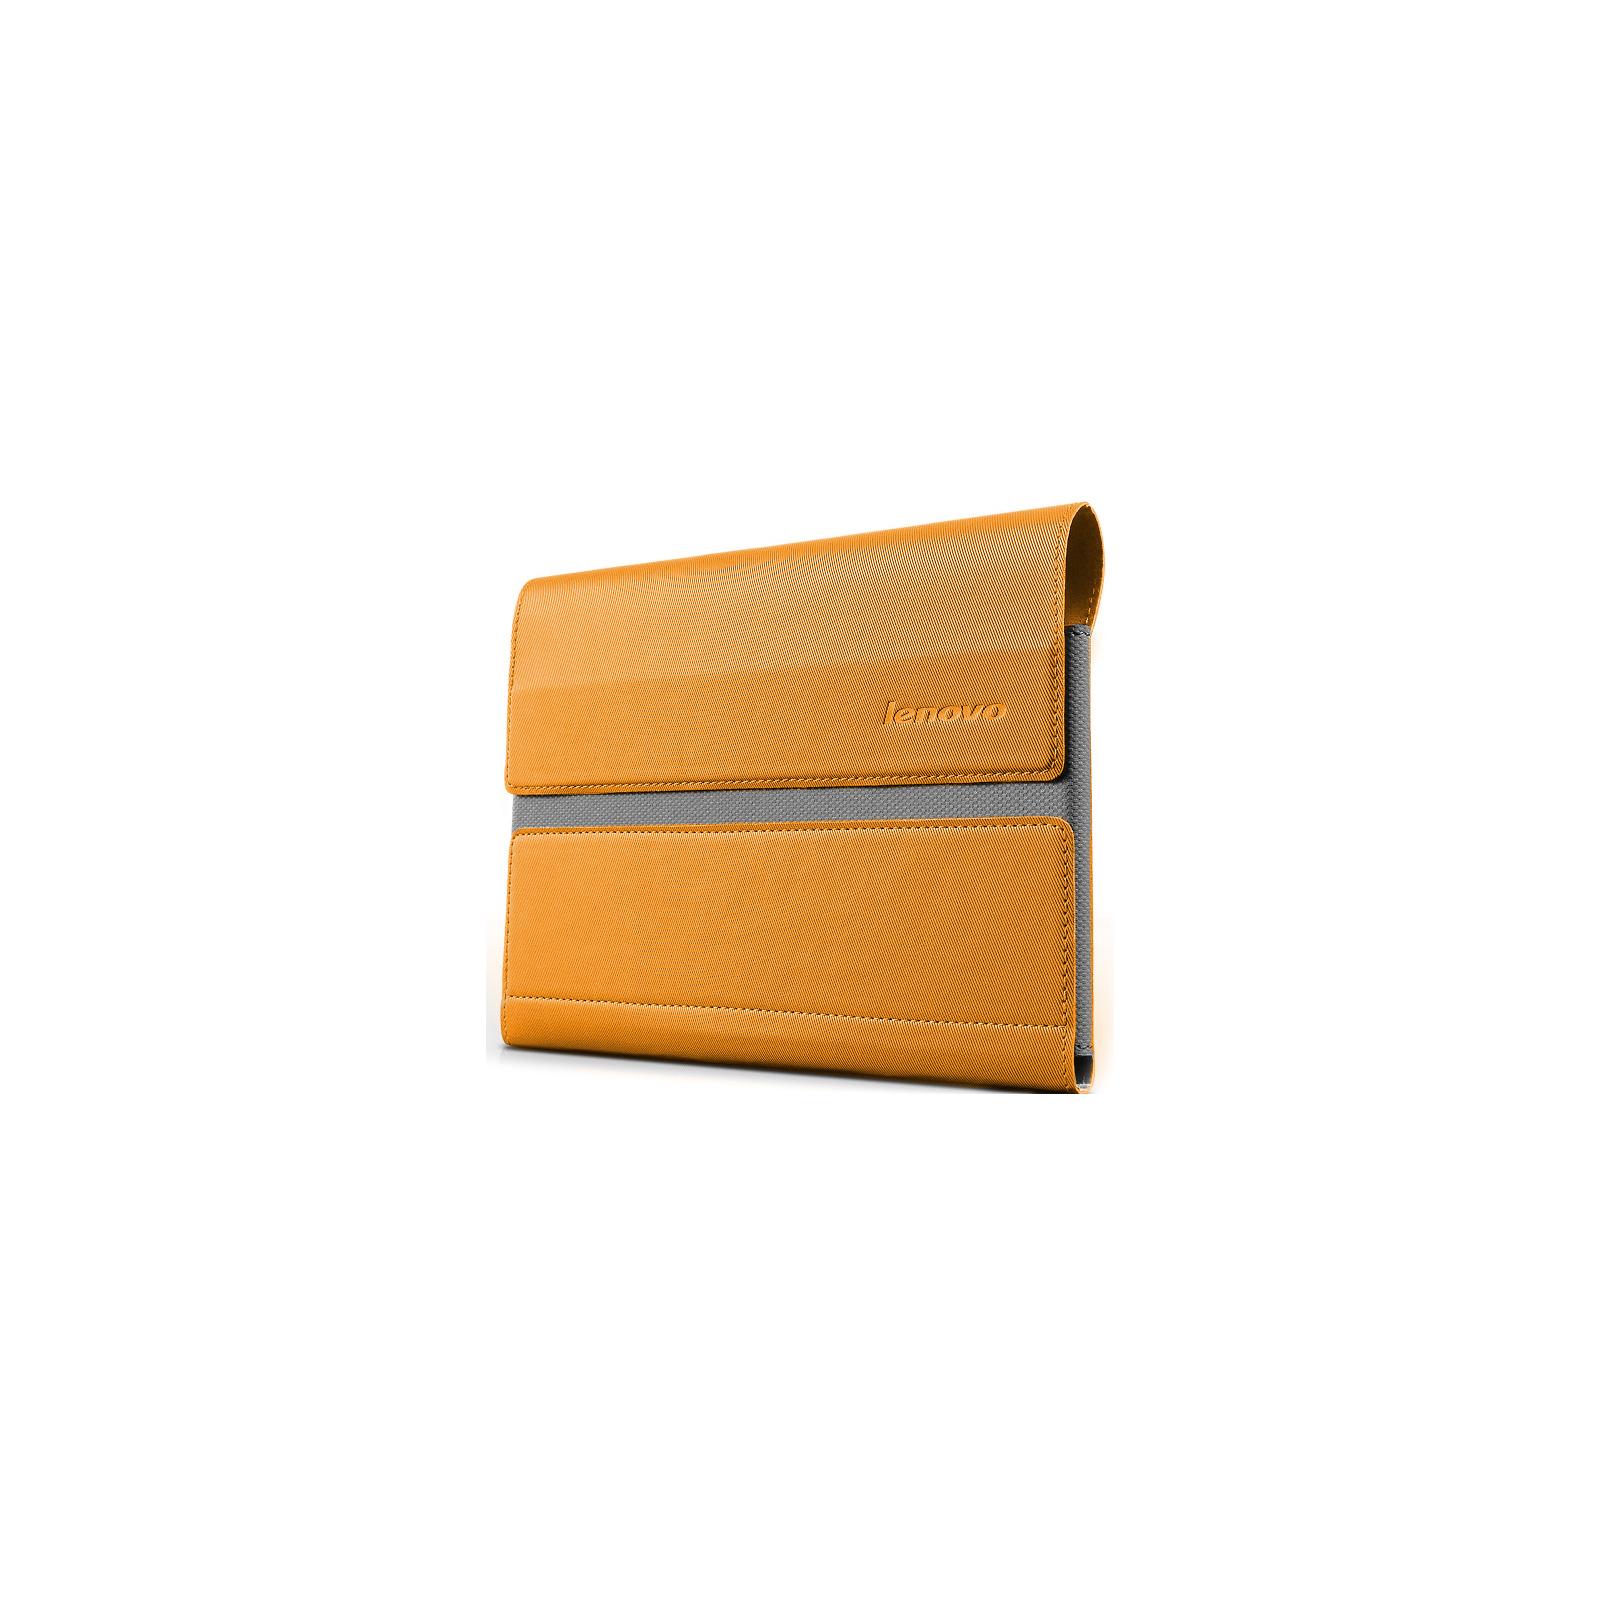 Чехол для планшета Lenovo 8' B6000 Yoga Tablet, Sleeve and Film Orange (888015977)